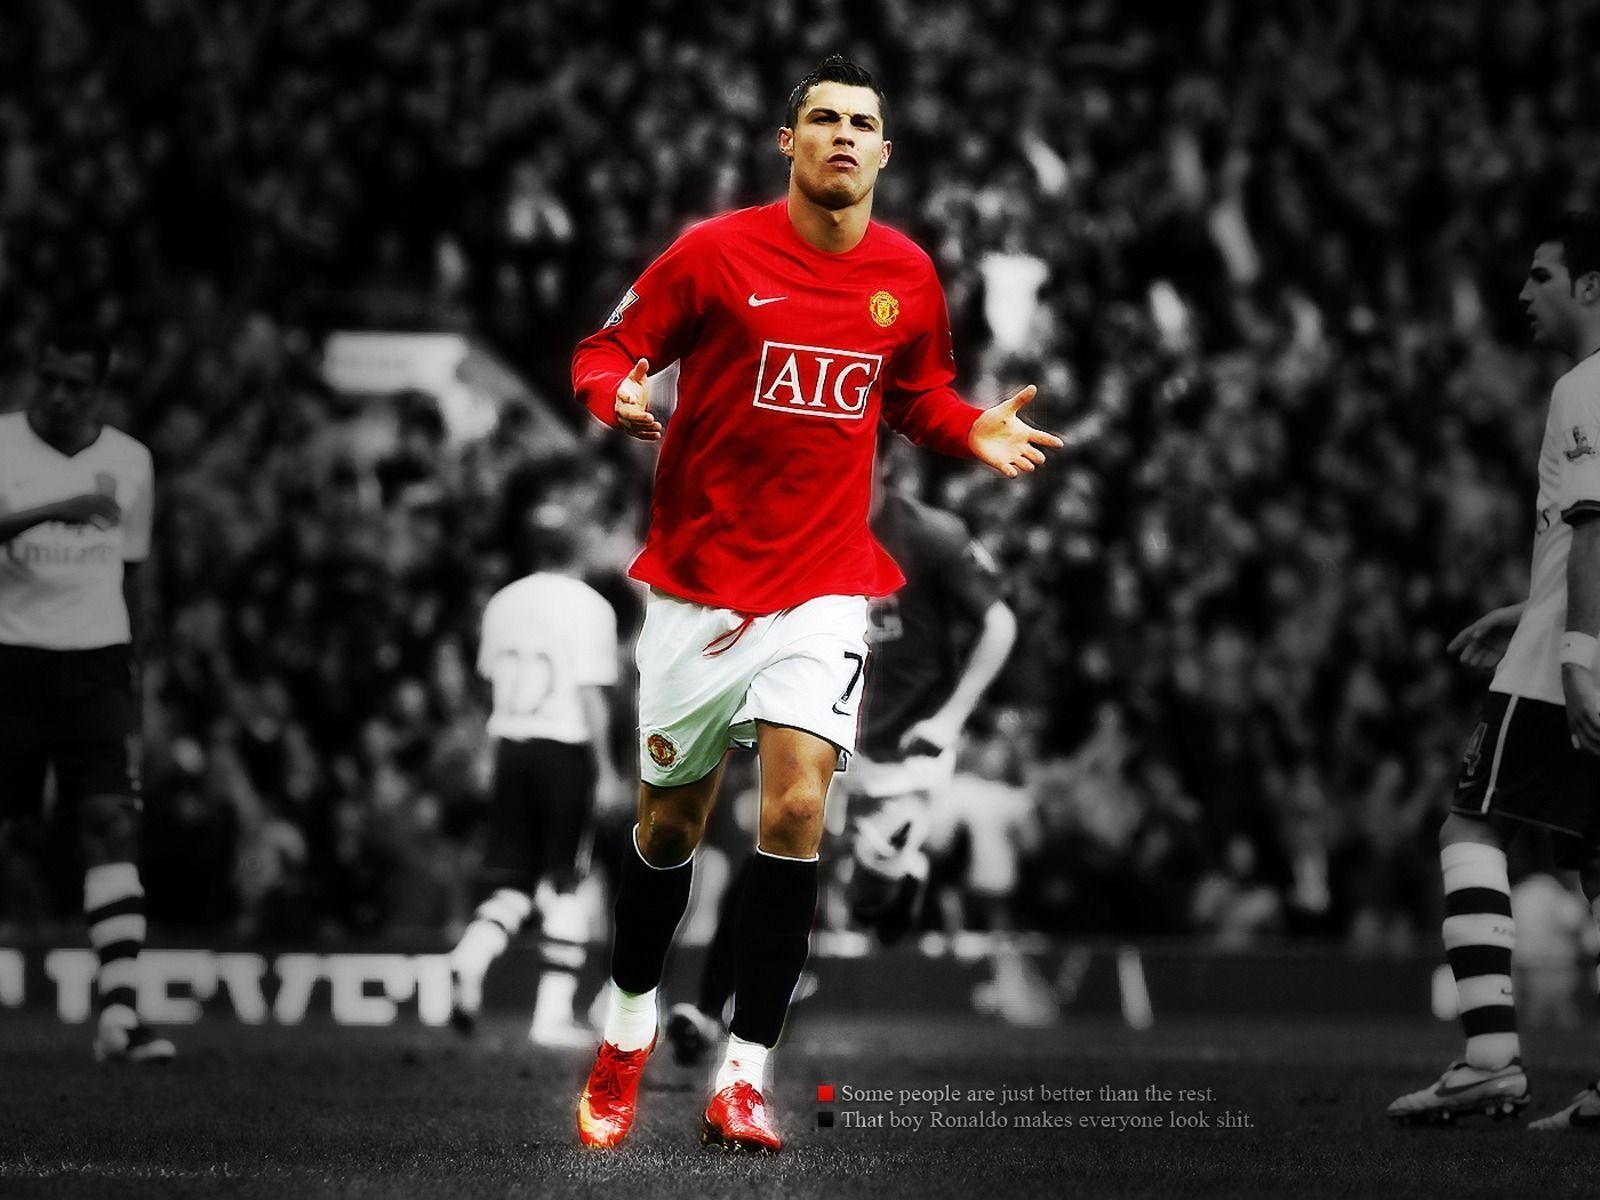 Cristiano Ronaldo Hd Wallpapers - QyGjxZ